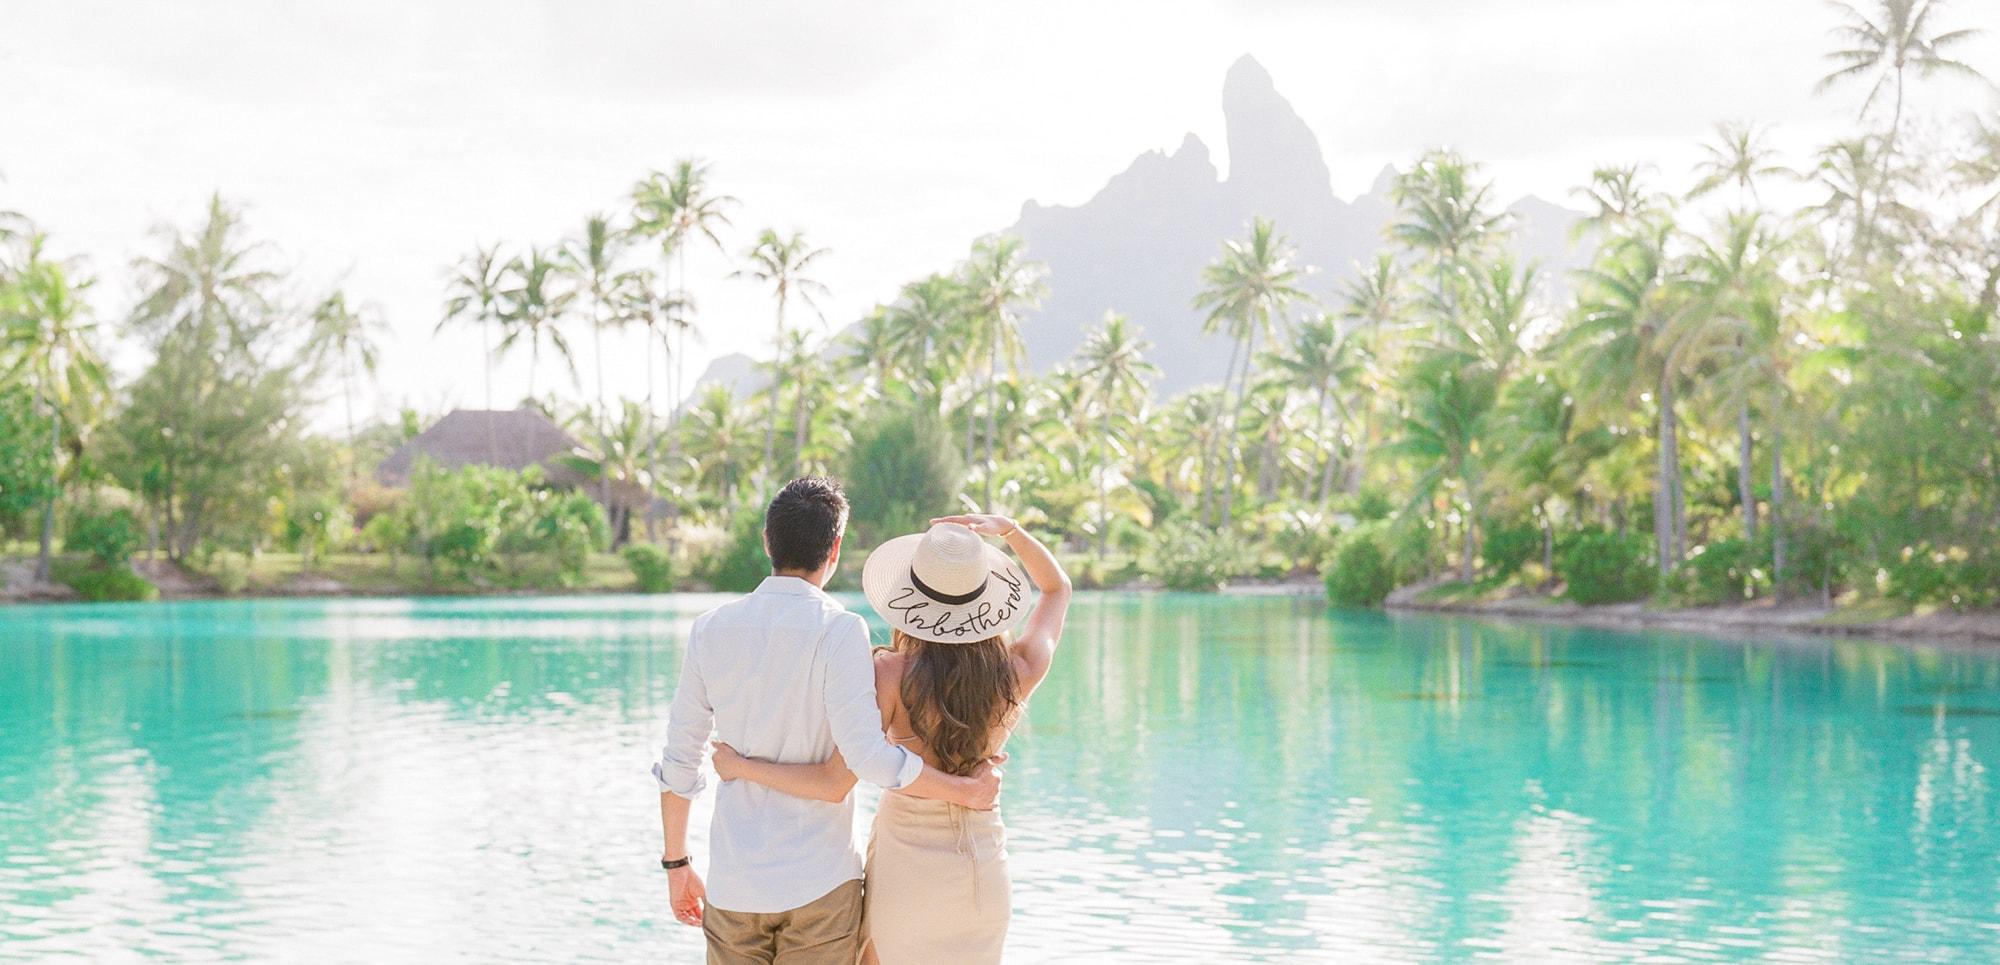 https://tahititourisme.com.au/wp-content/uploads/2021/04/PCP-Bora-Bora-Photographer-St-Regis-Honeymoon.jpg